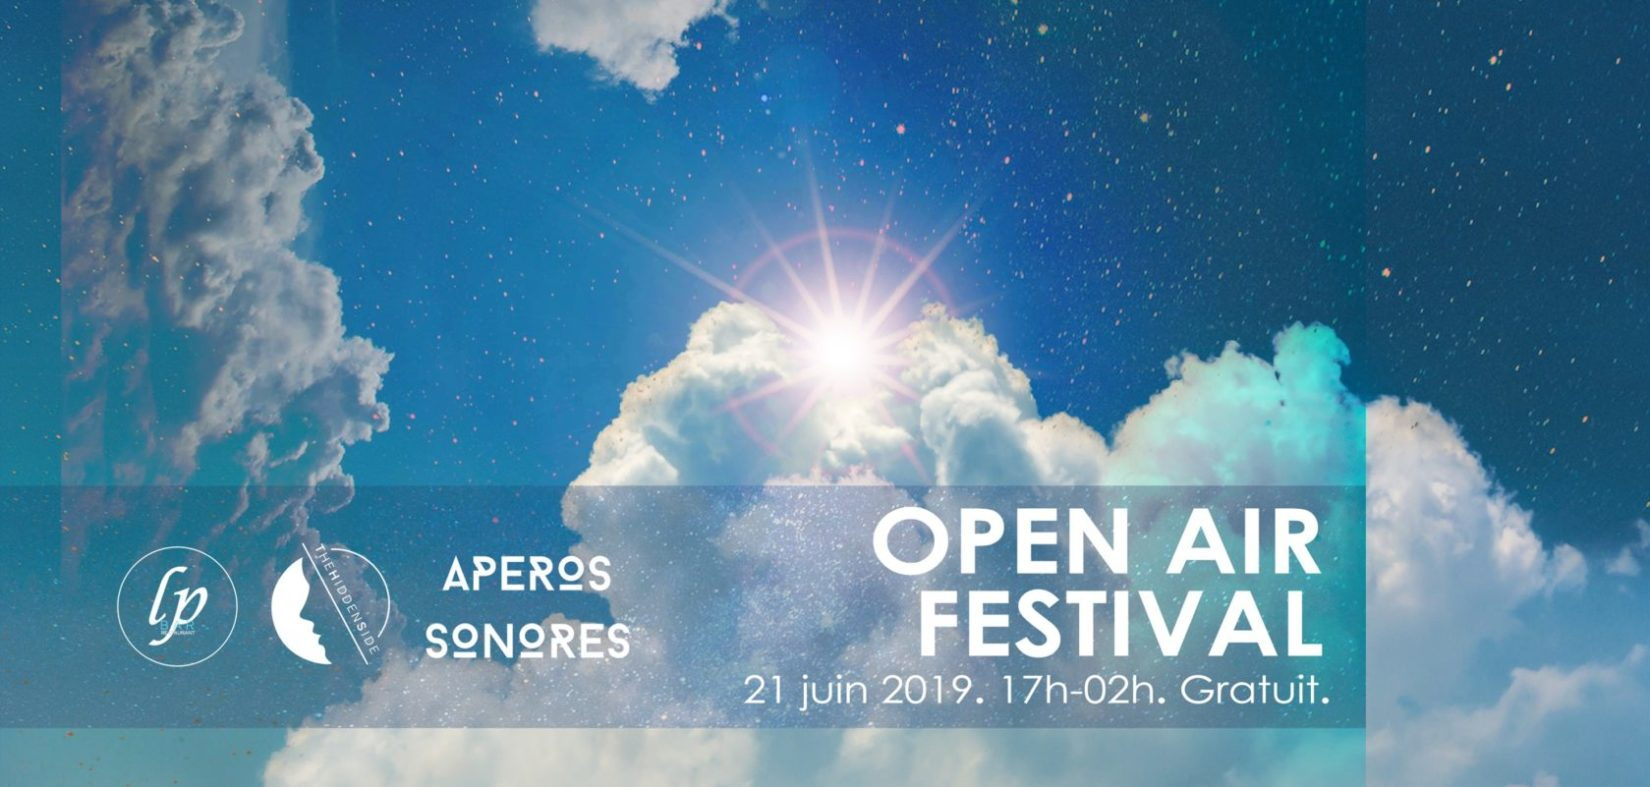 Apéros Sonores x THS x Les Platanes : Open Air Festival